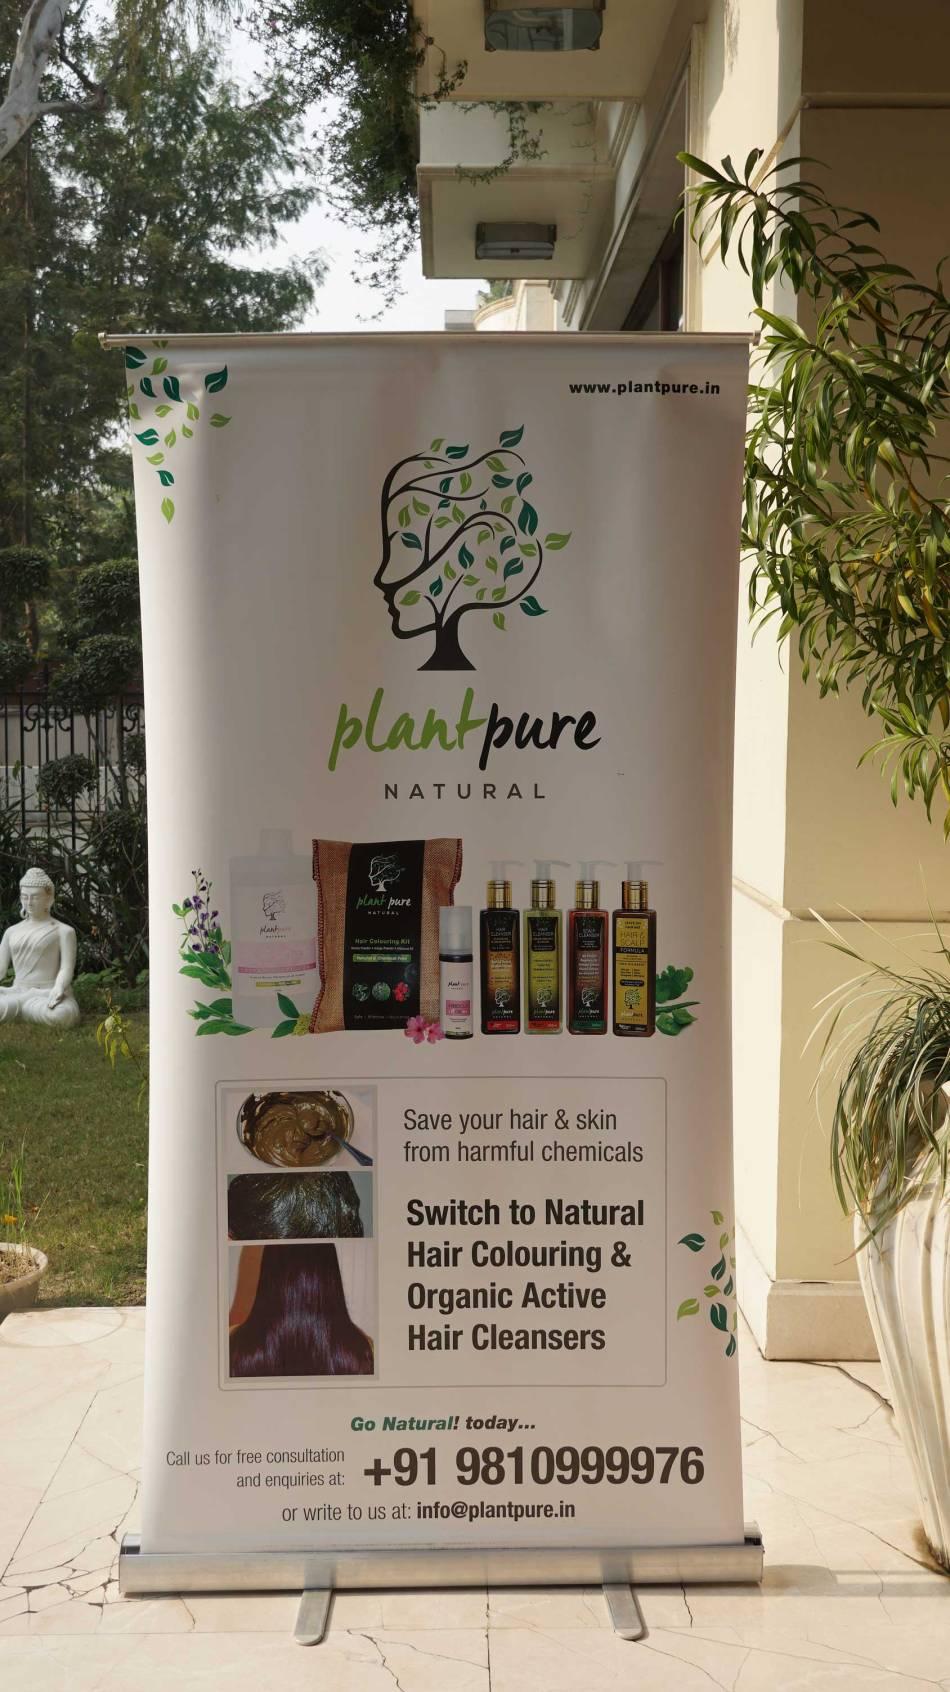 shine-your-light-plant-pure